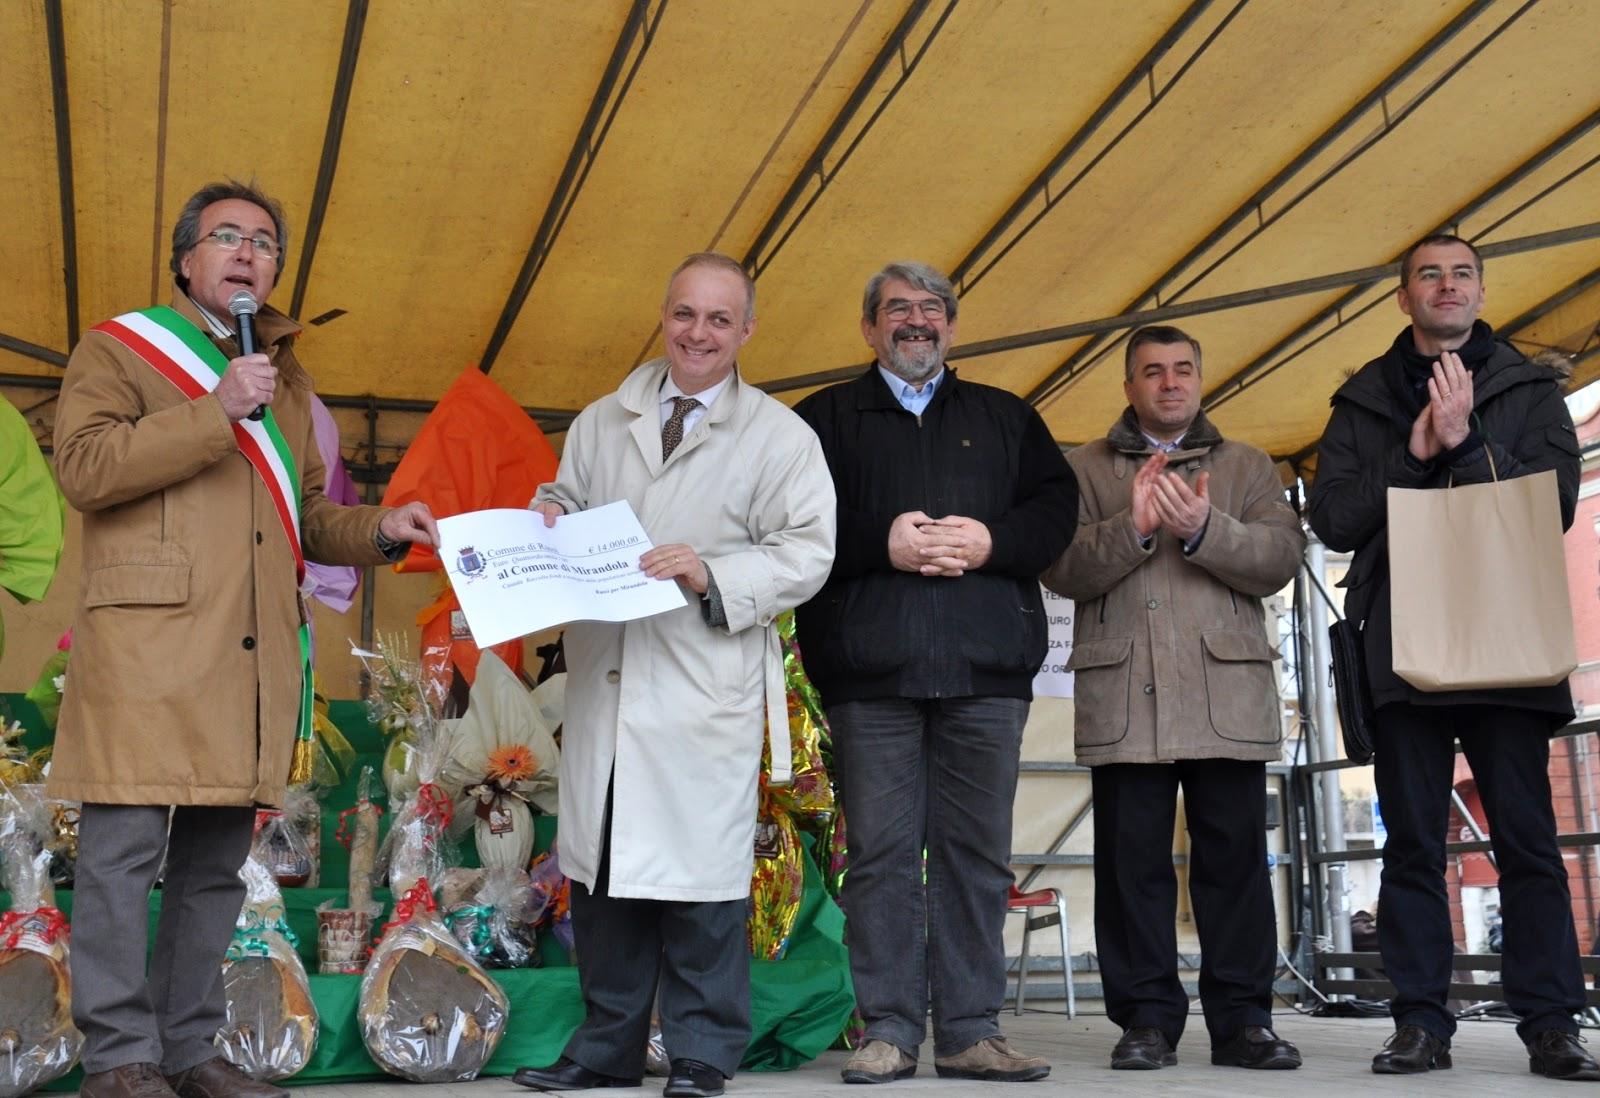 PavaglioneLugo.net - La Romagna Estense on-line: 17/03/13 - 24/03/13